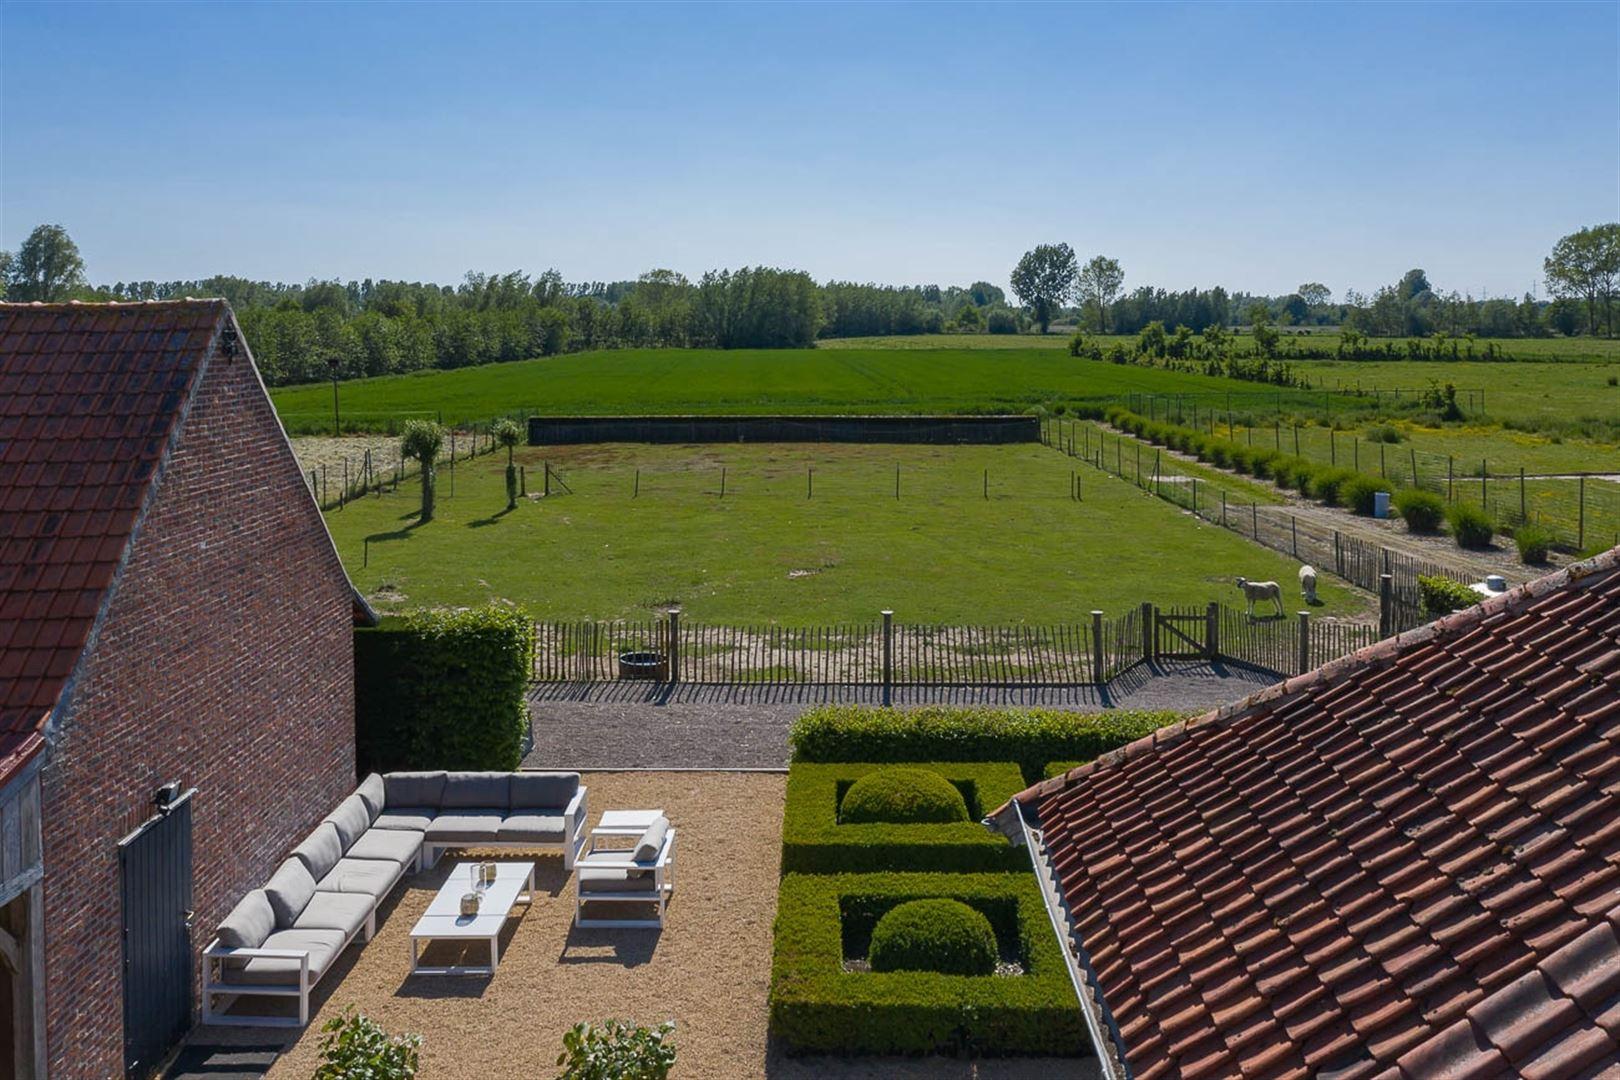 Foto 9 : Handelspand te 9160 LOKEREN (België) - Prijs € 1.400.000